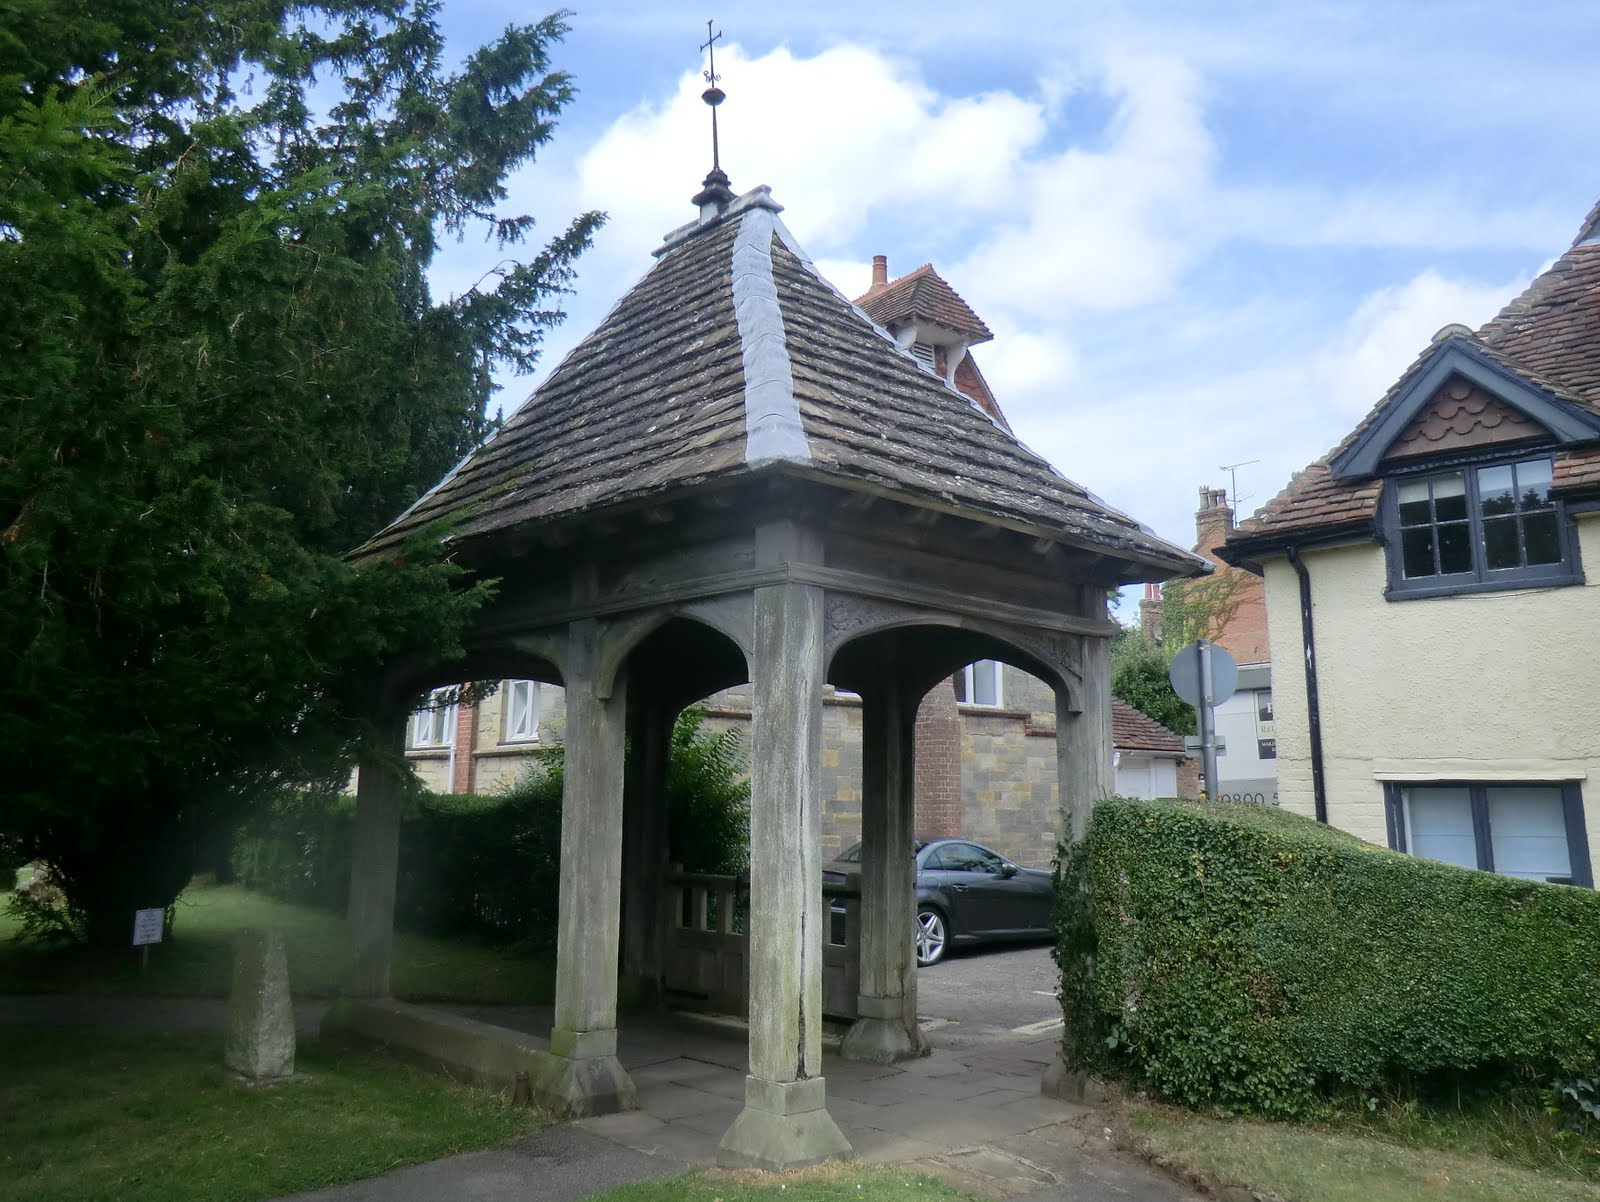 CIMG3444 Lychgate, Cuckfield churchyard